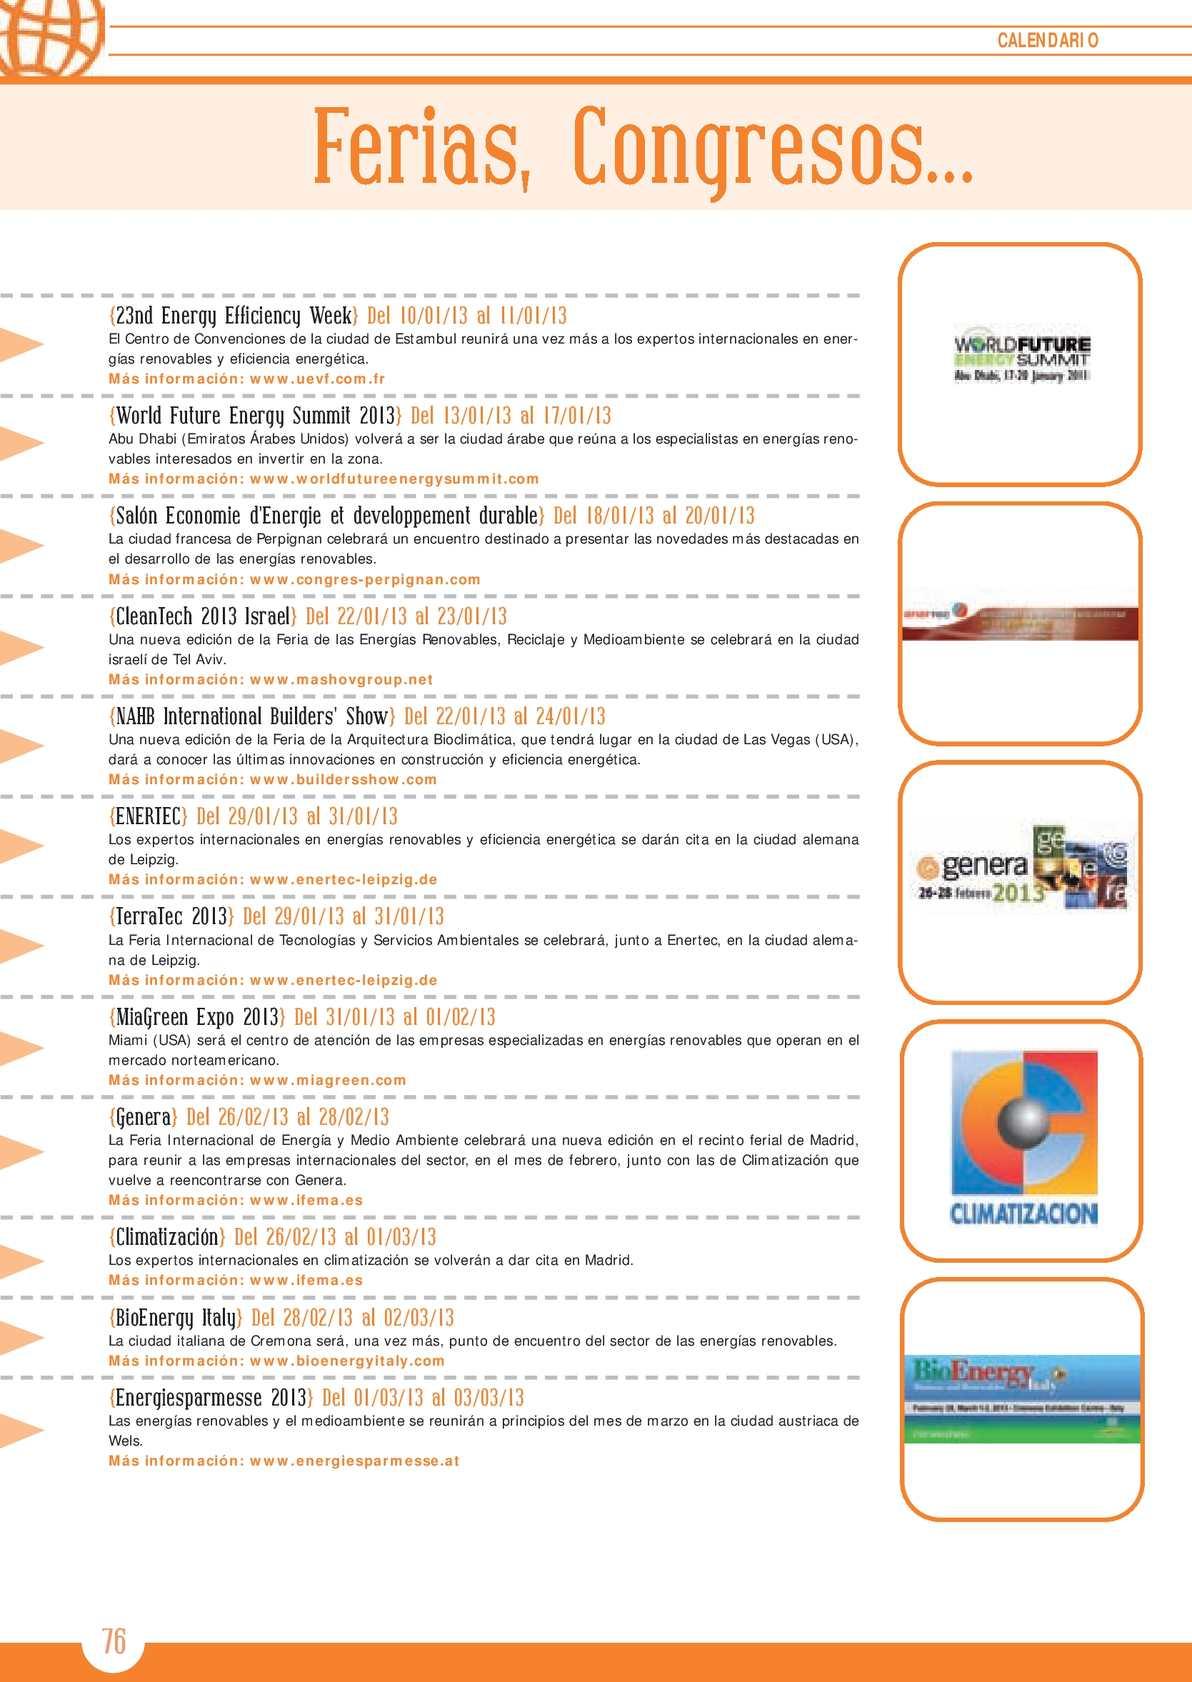 Calendario Fi Upm.Solar News N43 Calameo Downloader